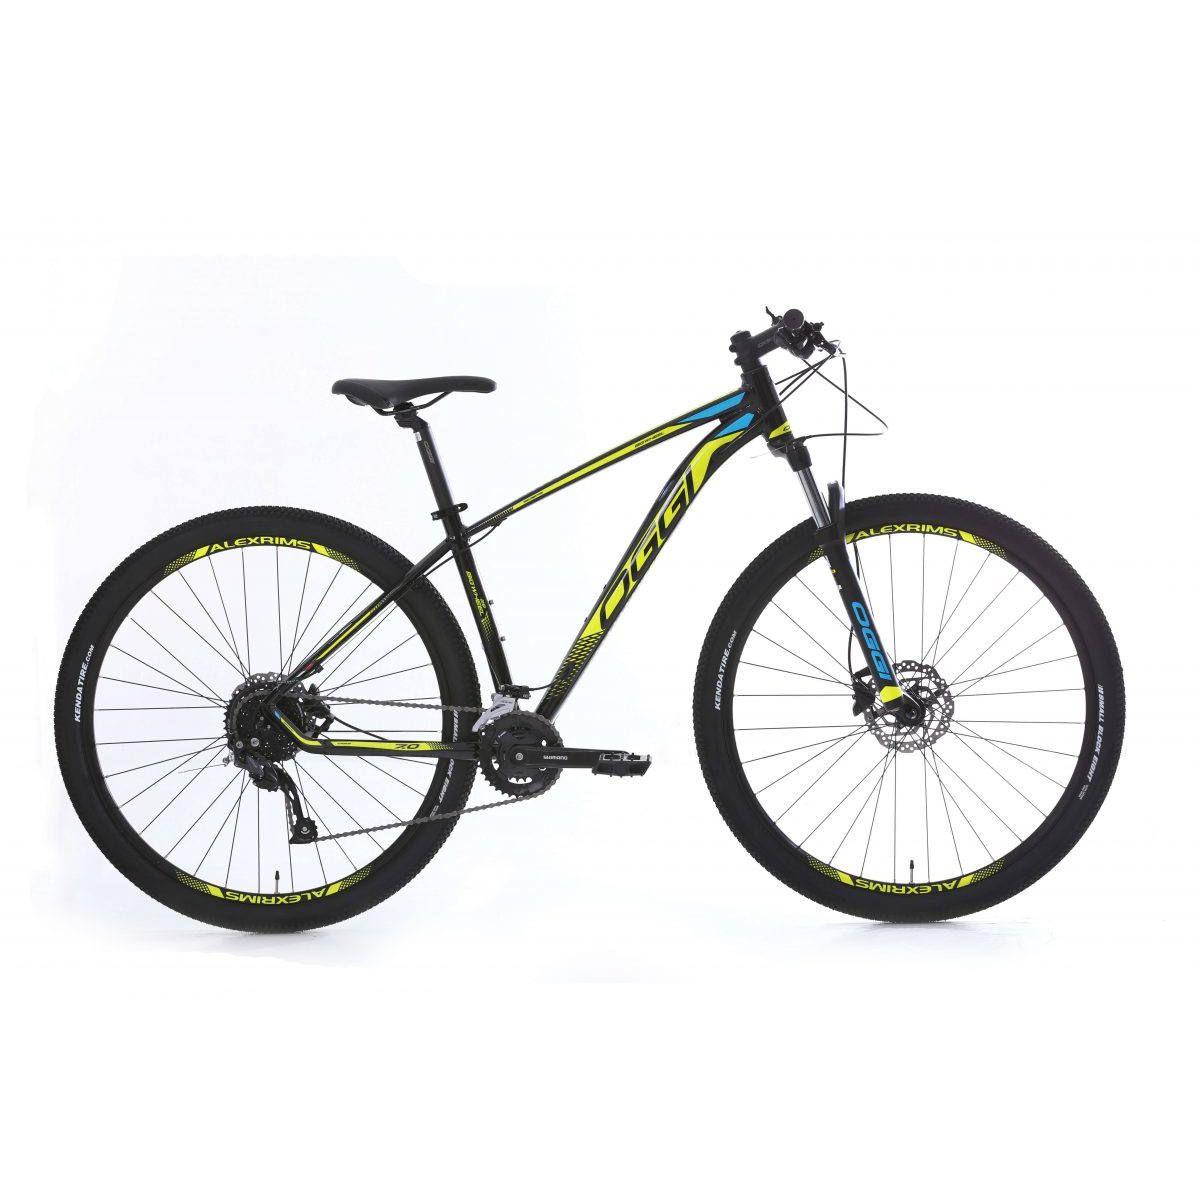 Bicicleta Oggi Big Wheel 7.0  18v 2020 aro 29 Amarelo/Azul